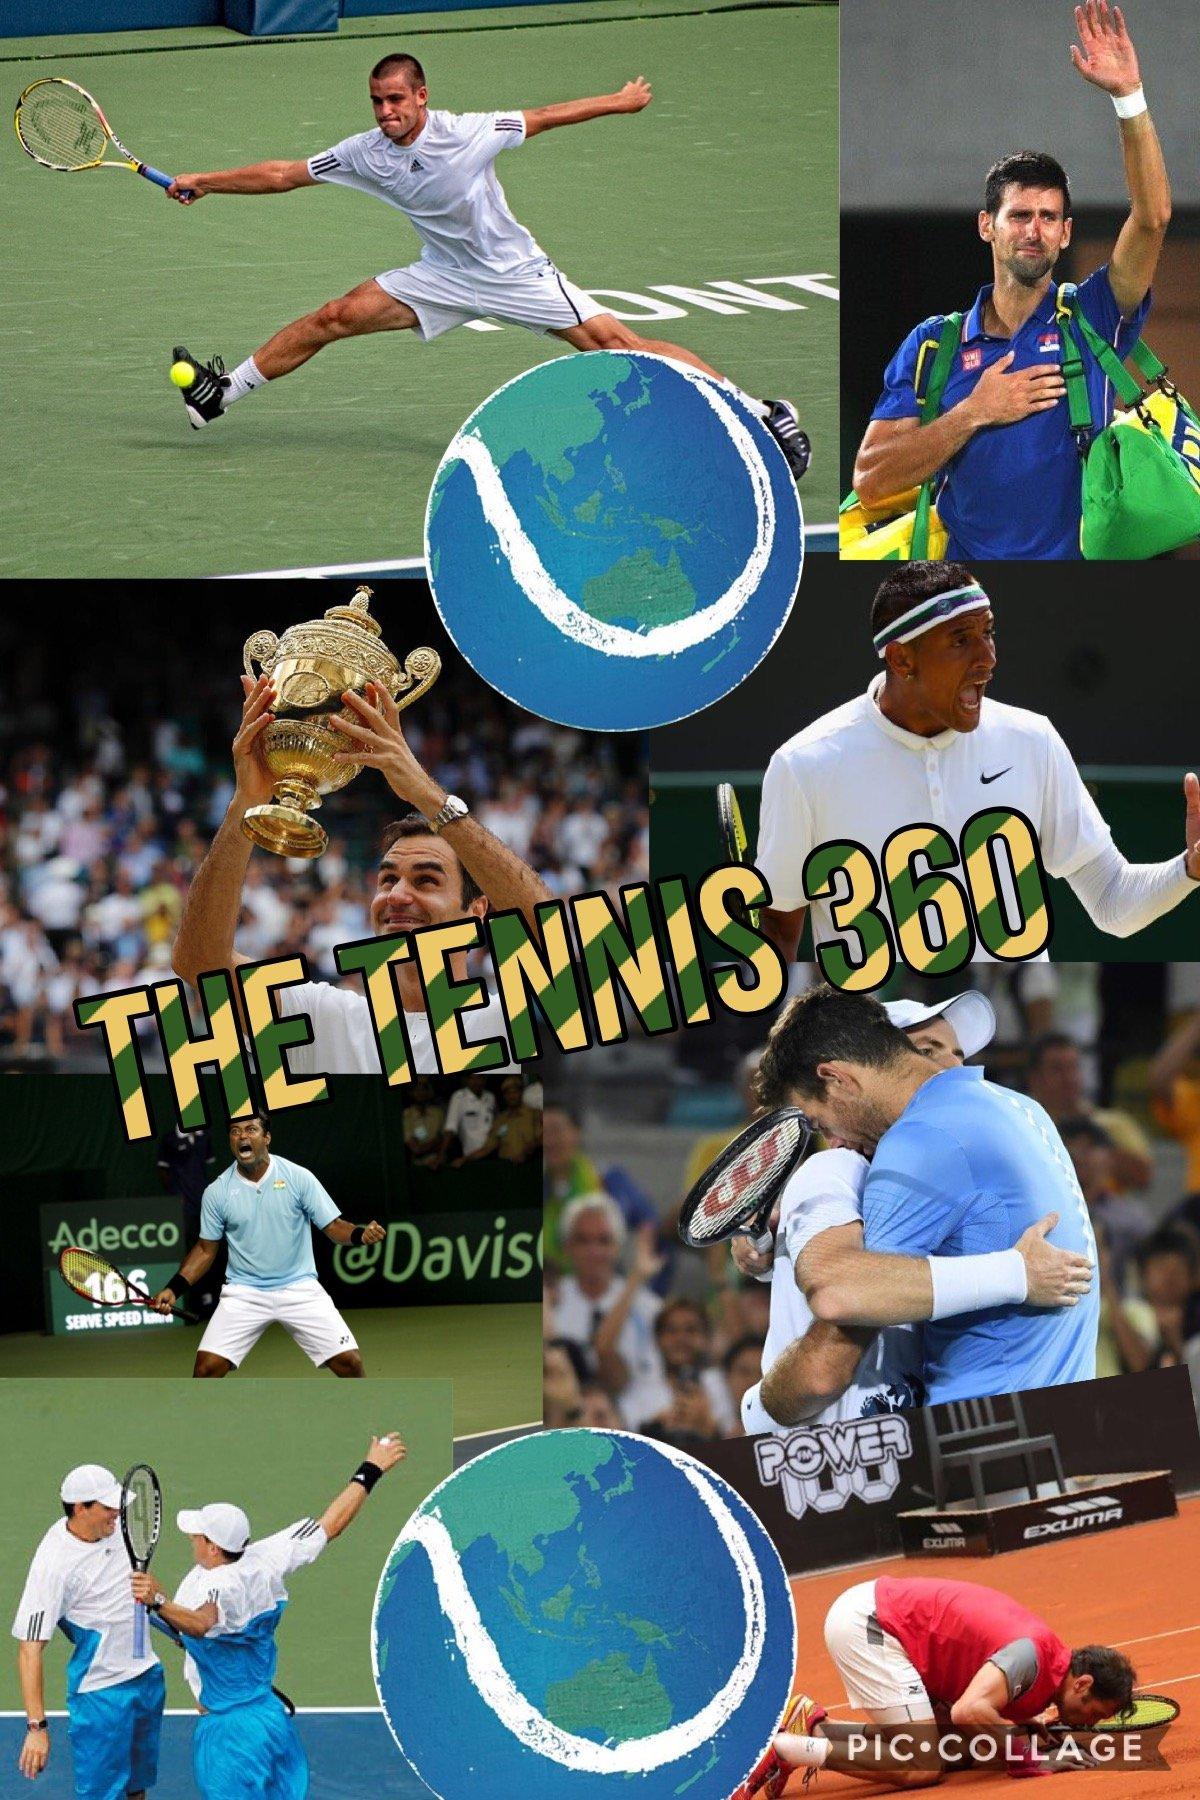 The Tennis 360